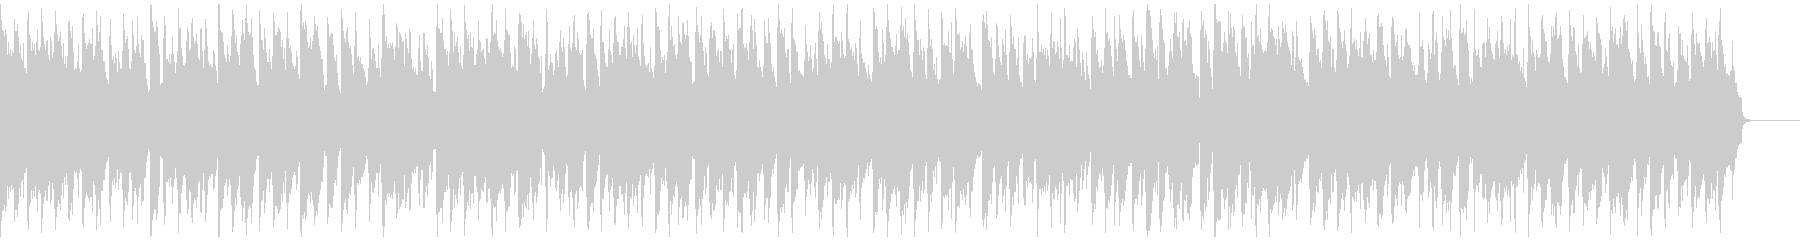 Handel's arrangement to the award ceremony Whispering rhythm's unreproduced waveform